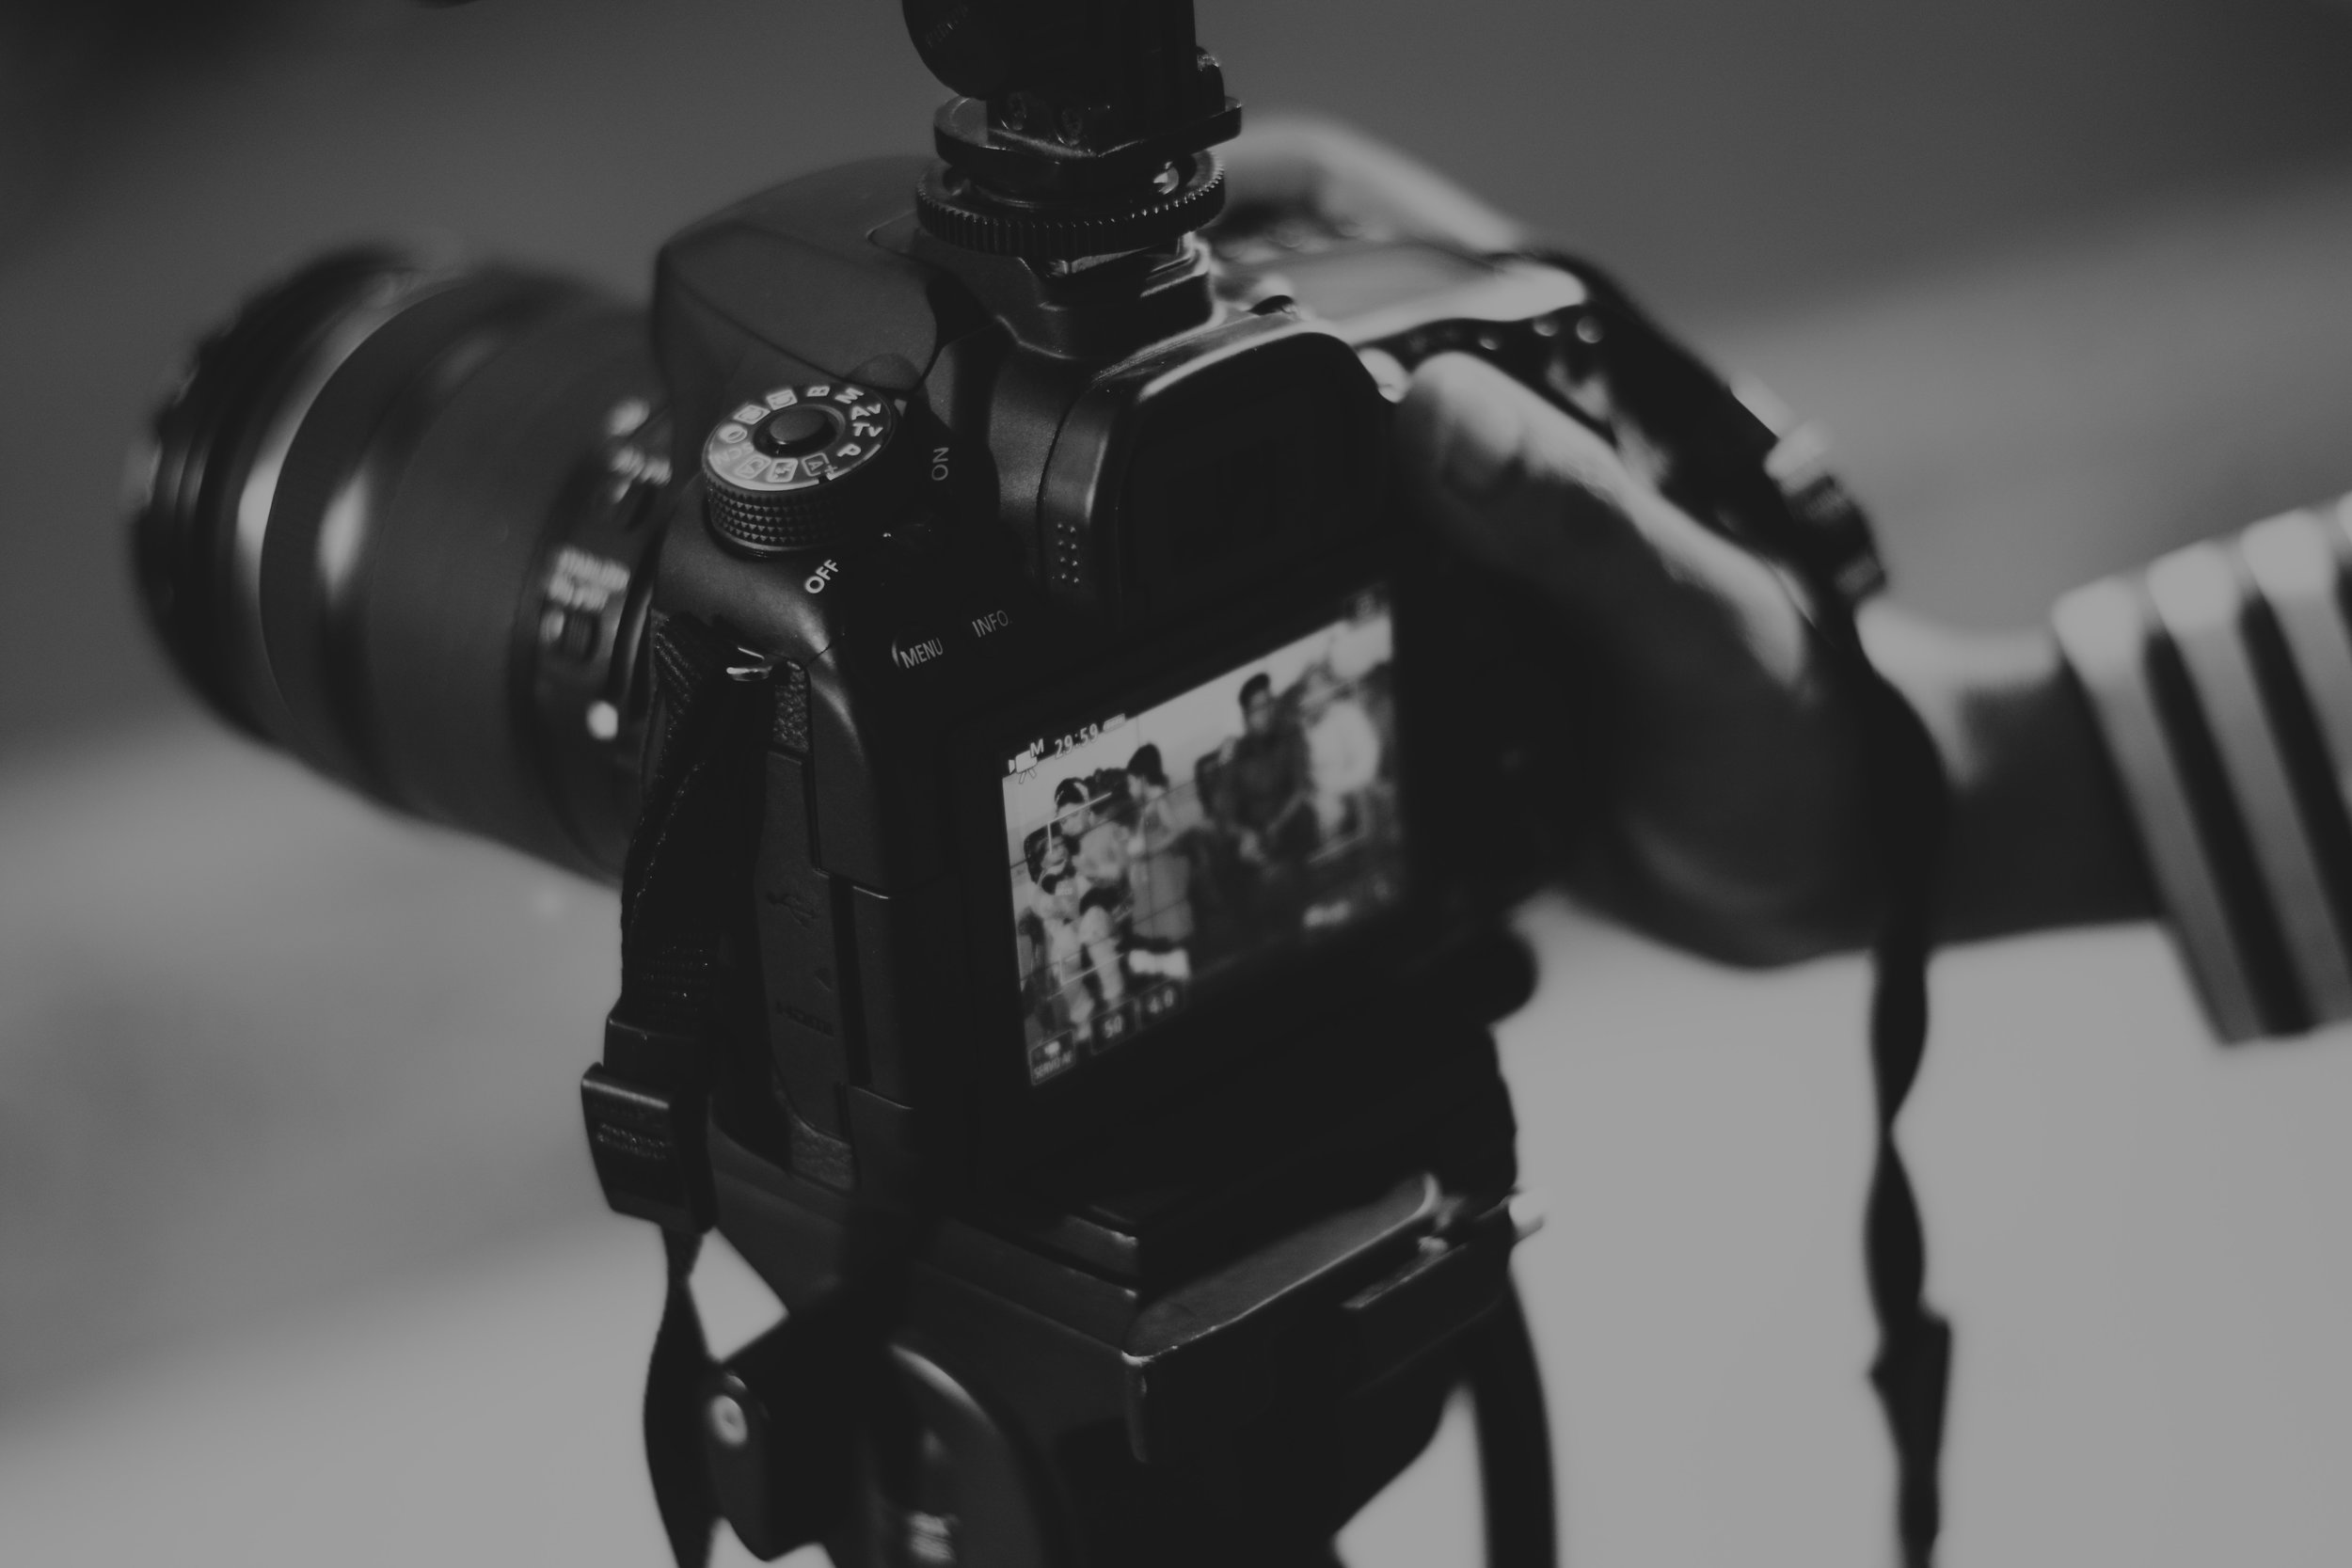 Event Photographer - Full Event Coverage, Professional Equipment, Lightning, Quick Turnaround$200/HR